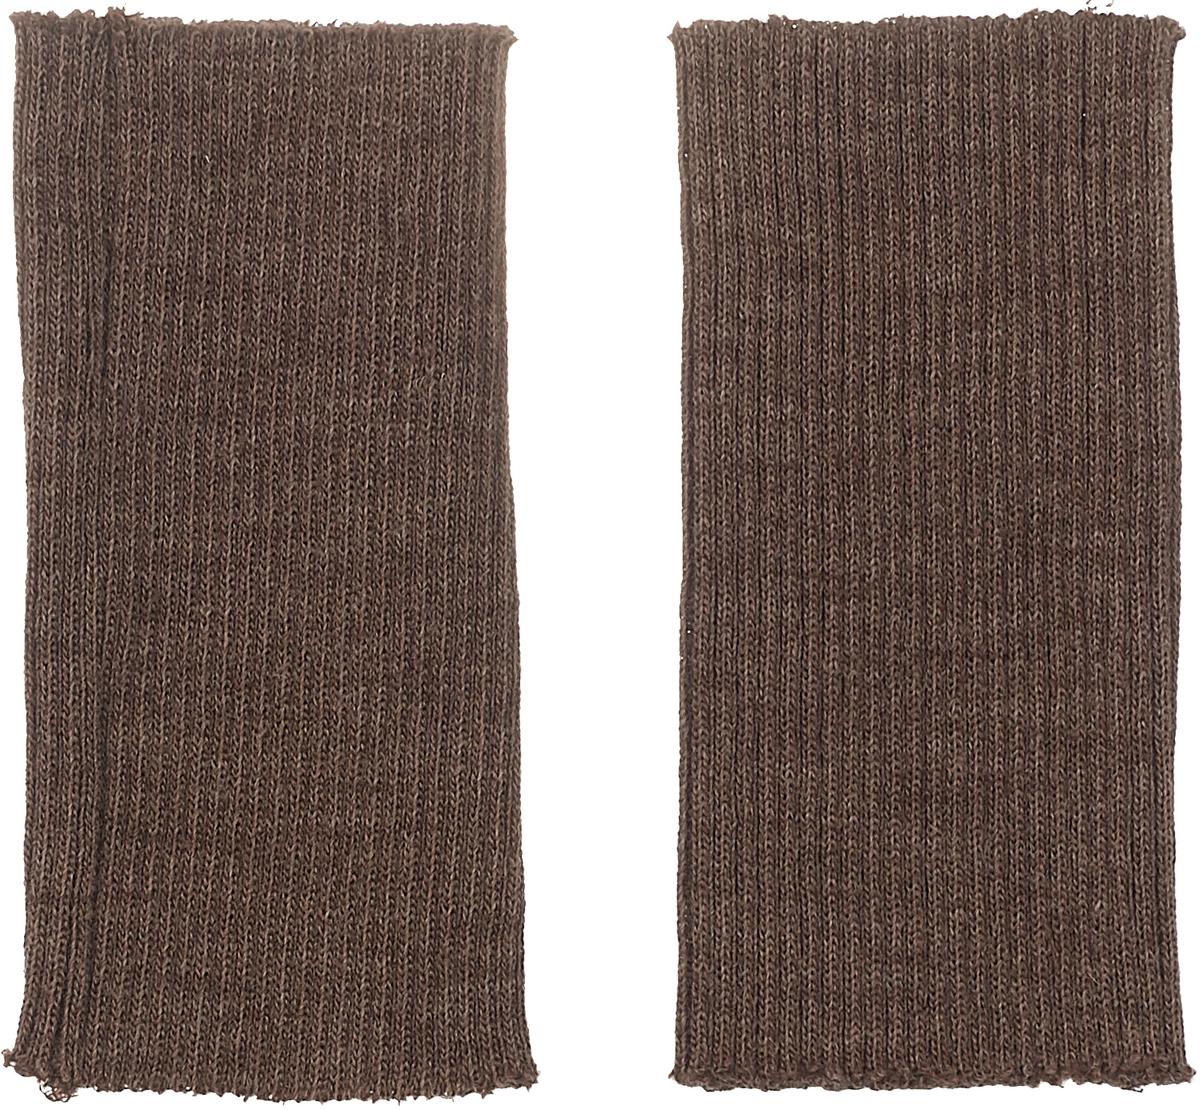 Манжеты Marbet Трикотаж, 14 х 7 см, цвет: коричневый меланж. 112 заплатка marbet самоклеющаяся цвет васильковый 16 х 10 см 123